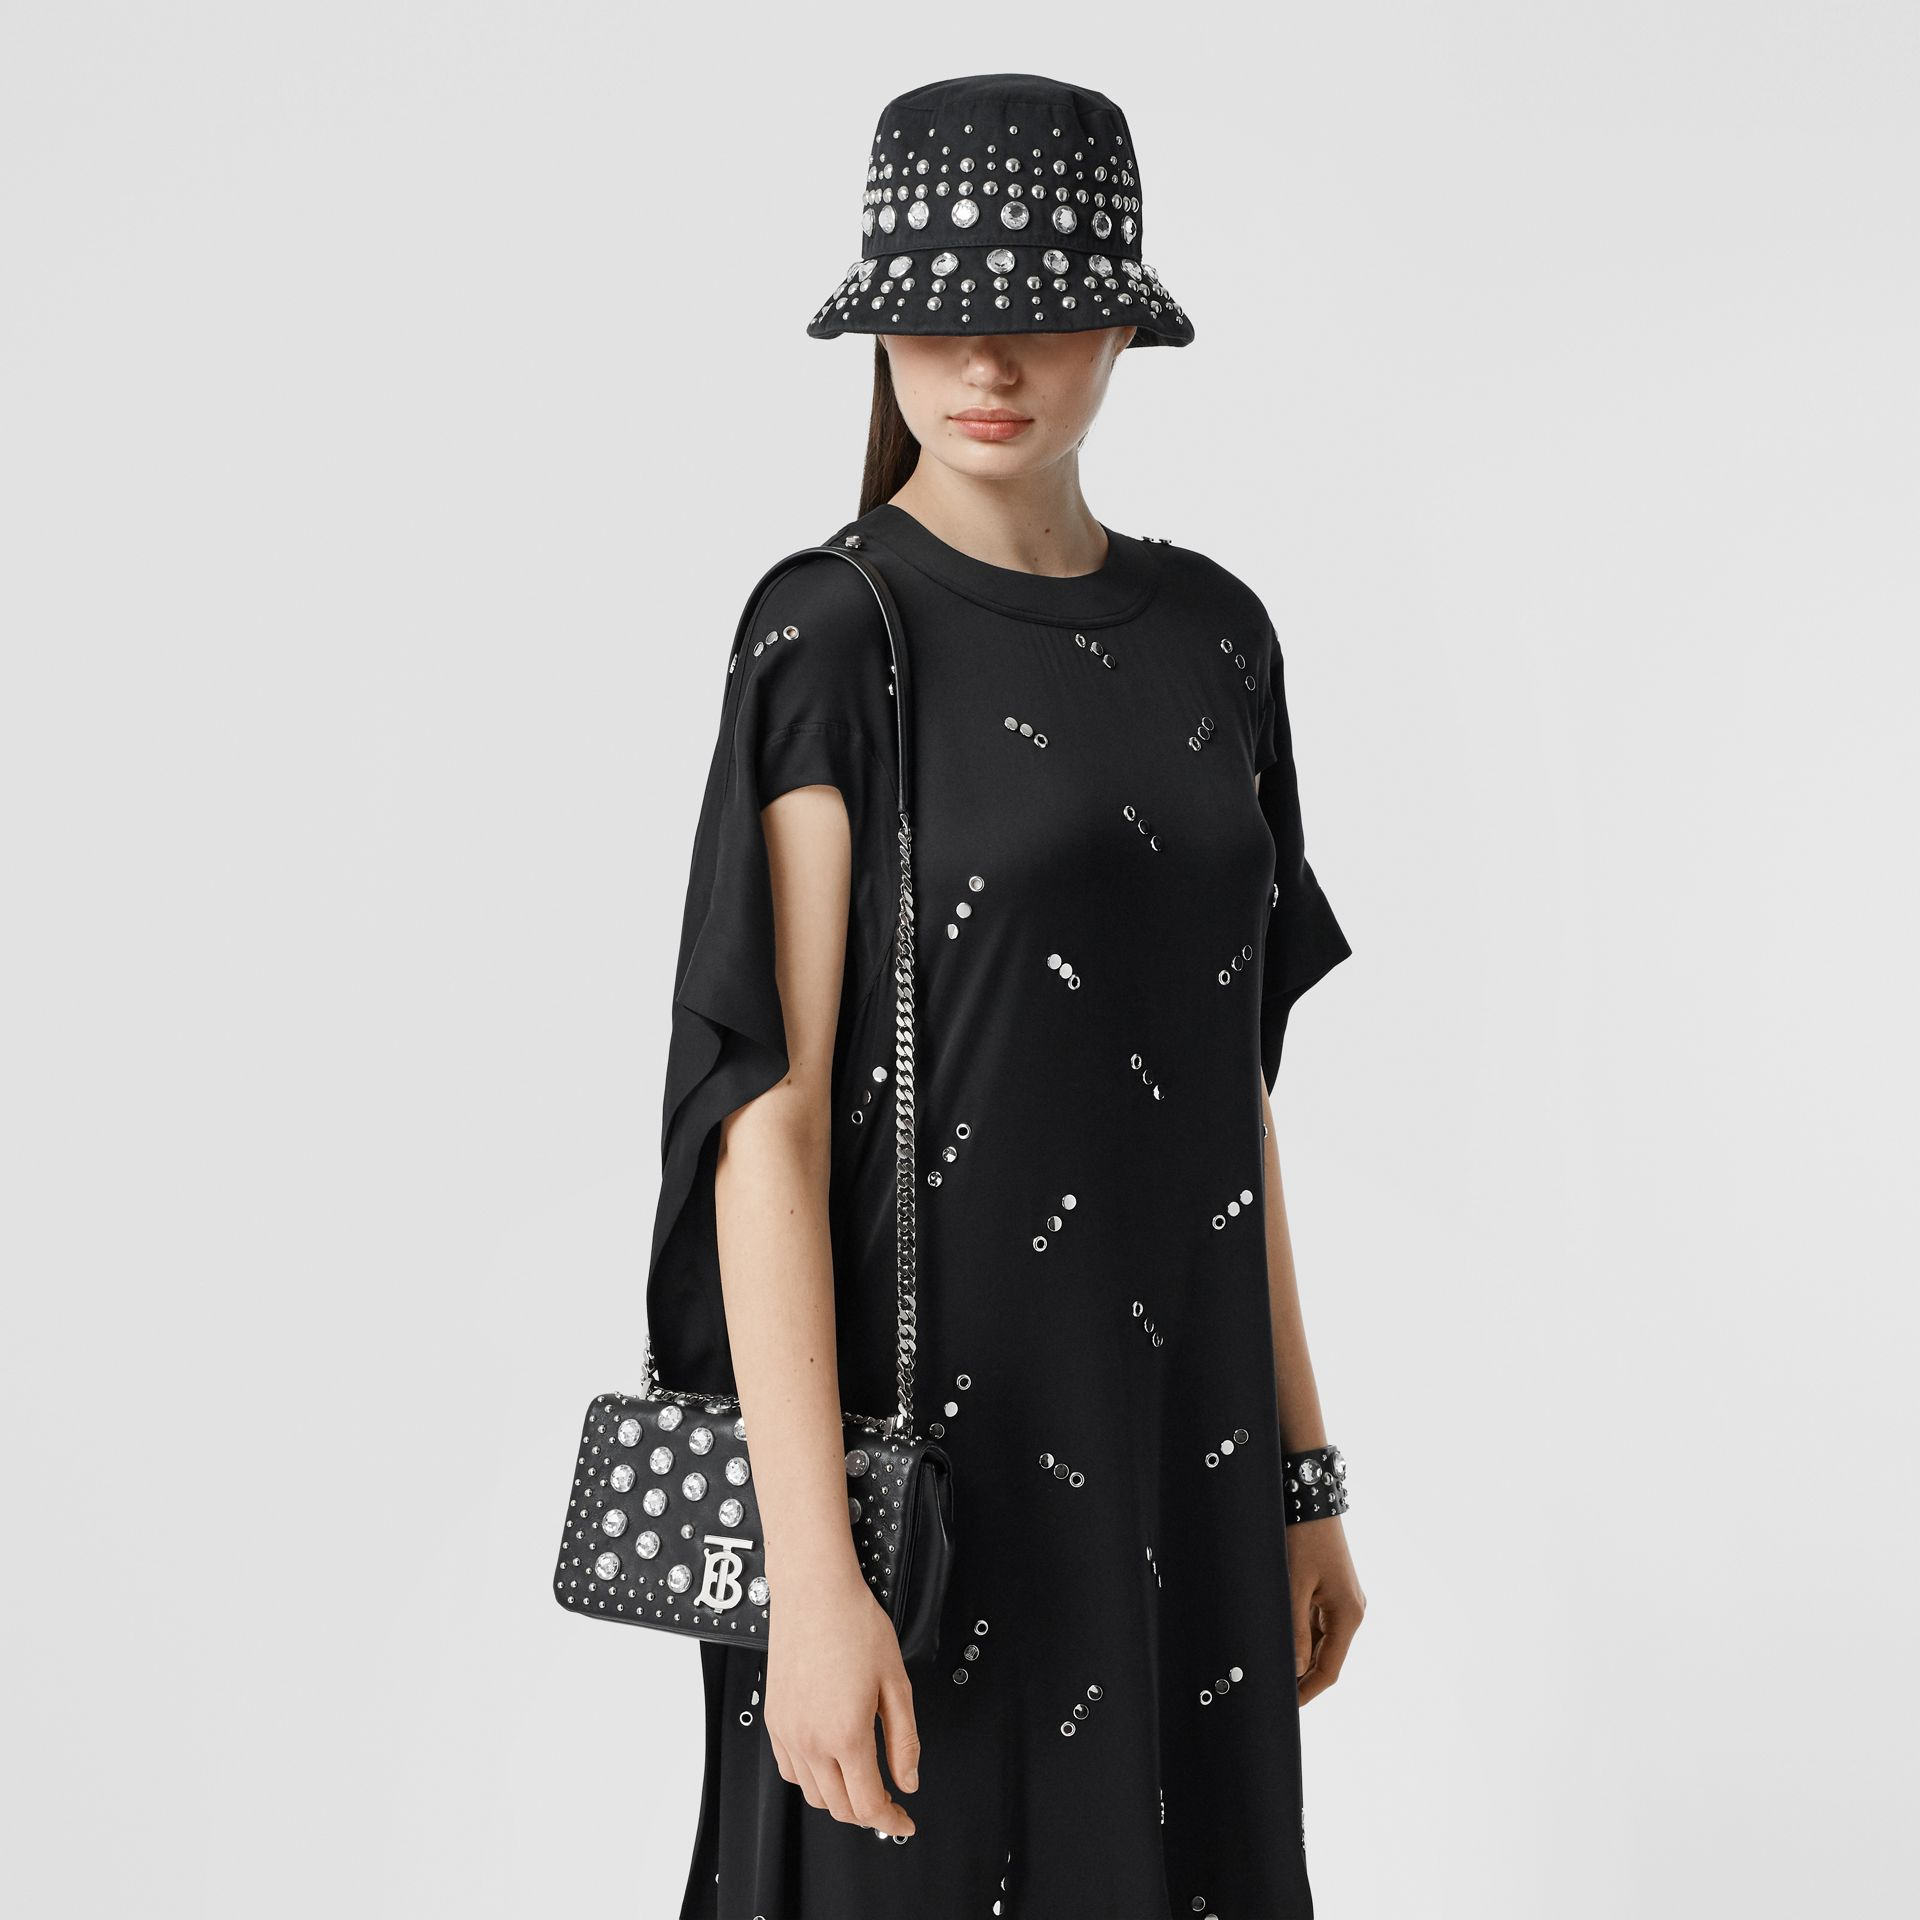 Small Embellished Lambskin Lola Bag in Black - Women | Burberry - gallery image 2